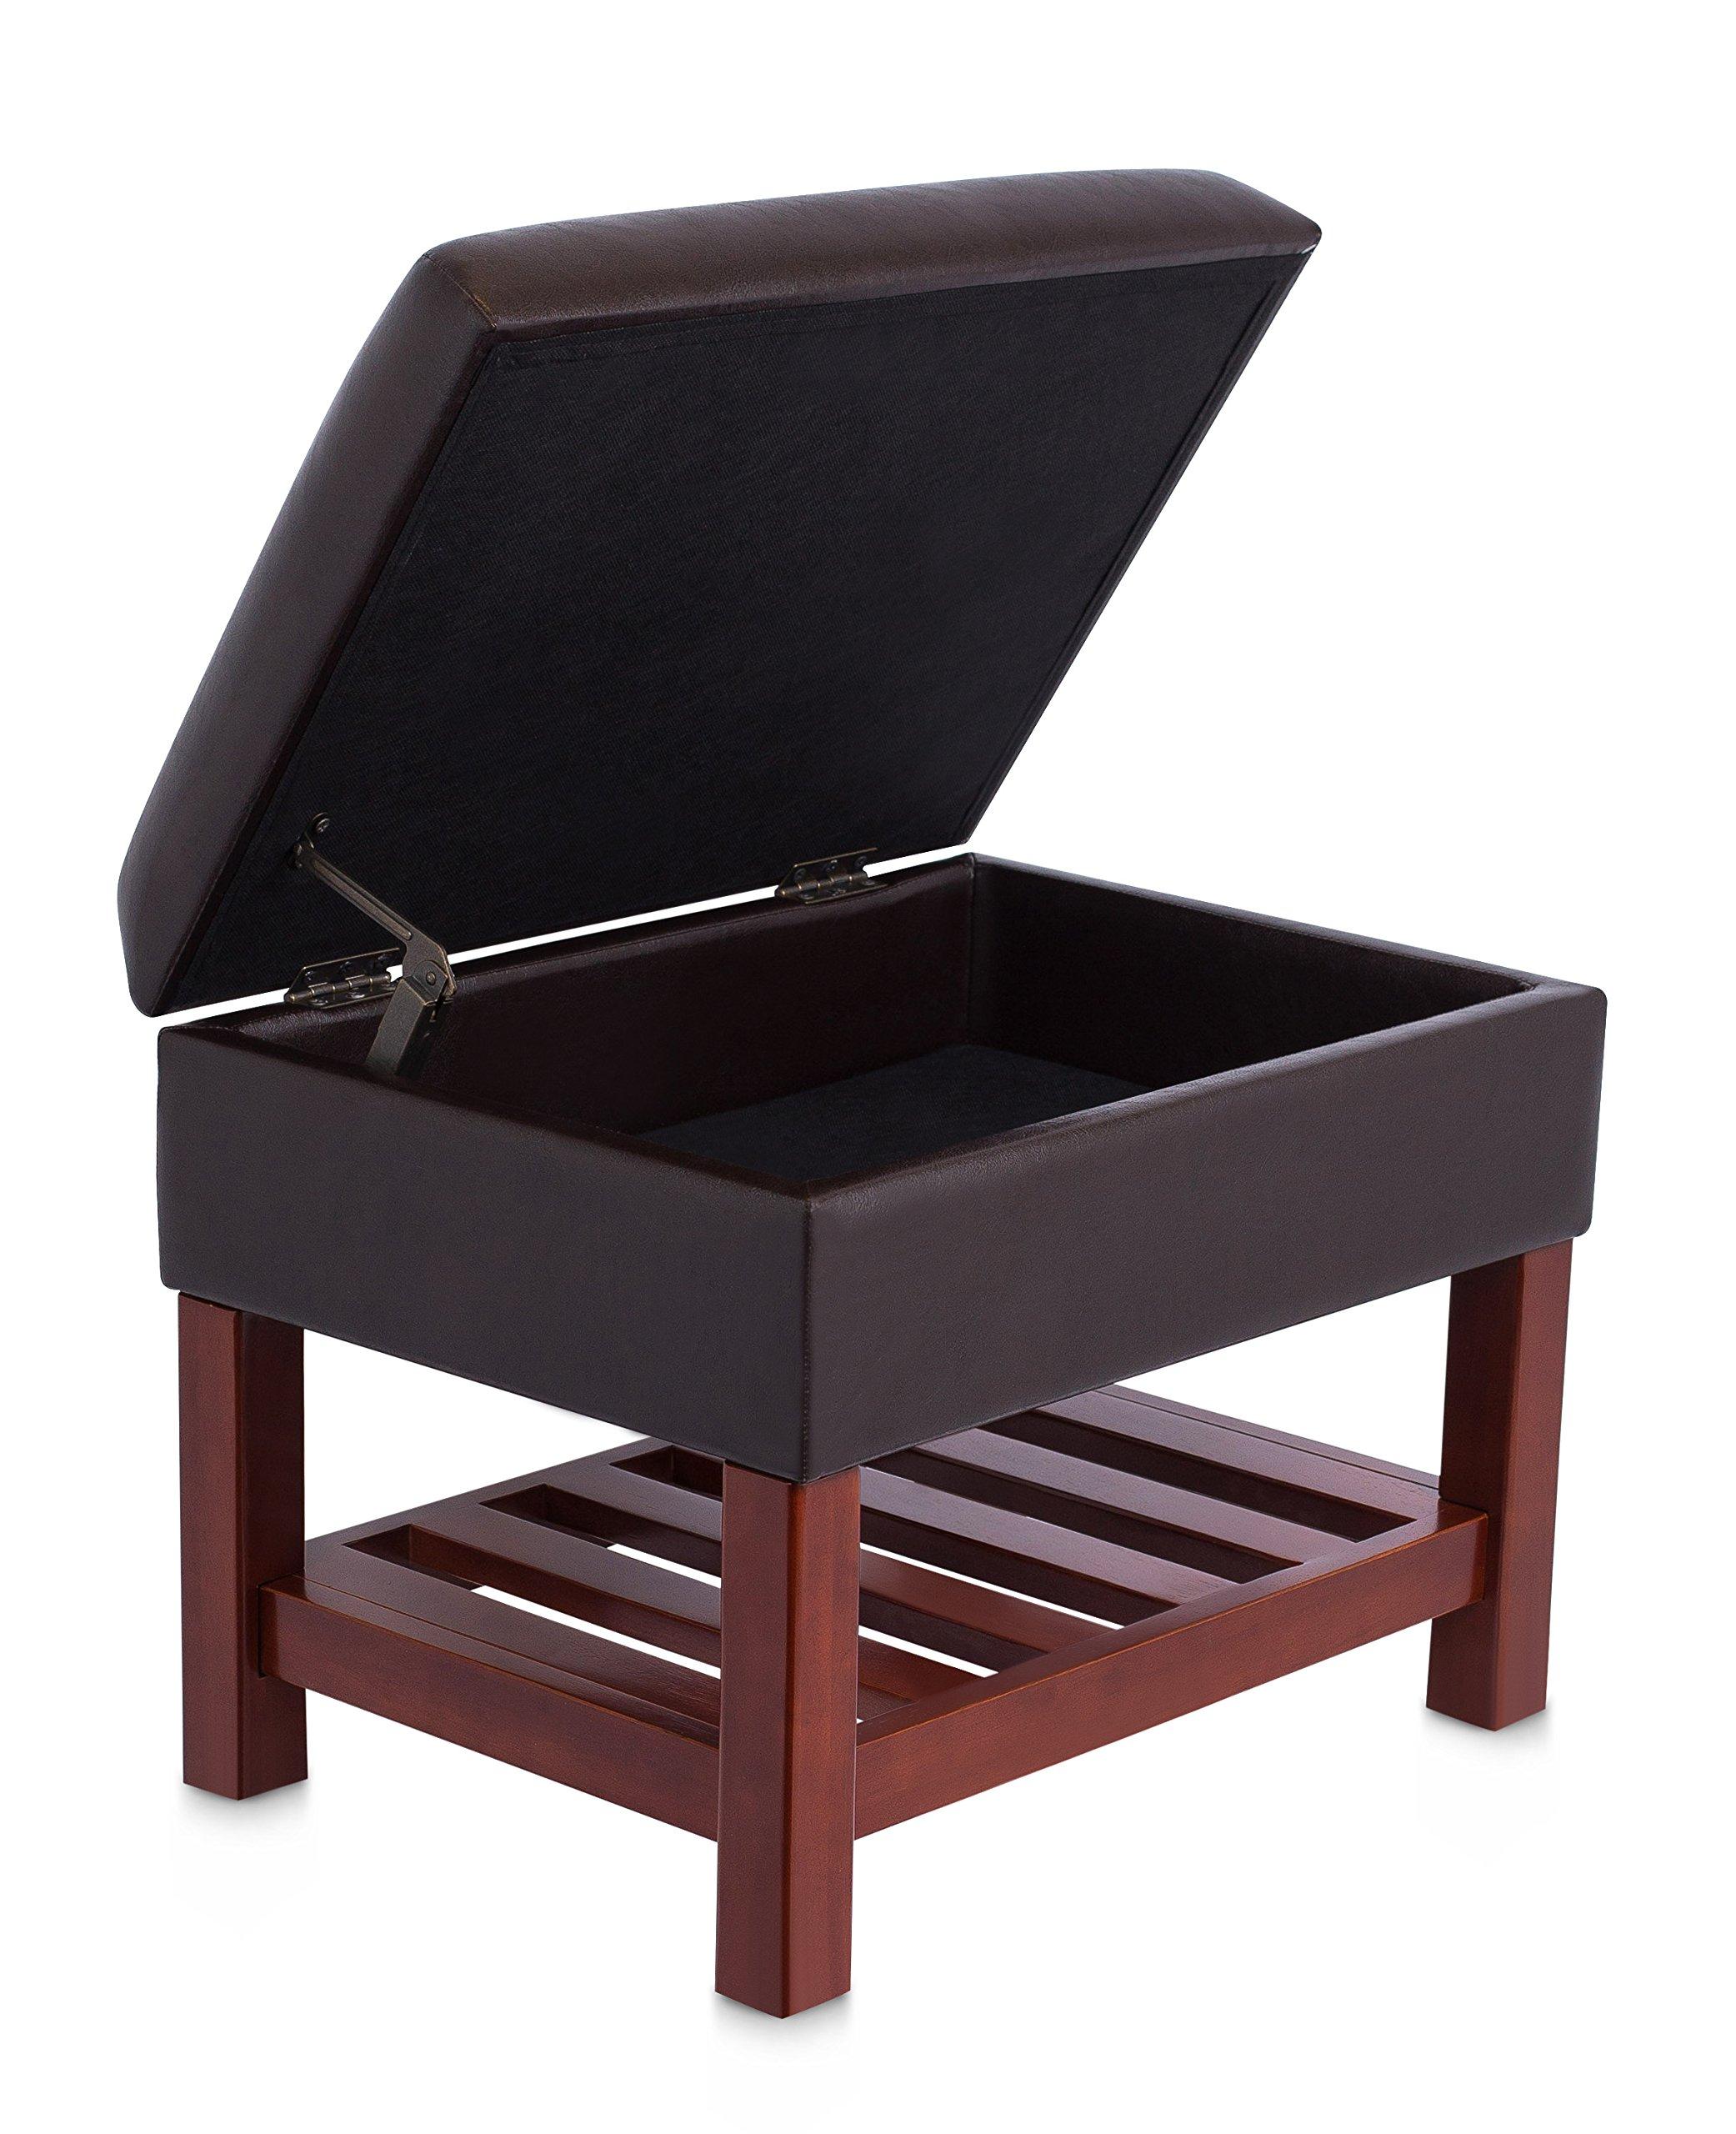 BirdRock Home Upholstered Storage Stool Ottoman | Faux Leather Padded Foot Stool | Wooden Storage Shelf Legs | Dark Brown & Walnut